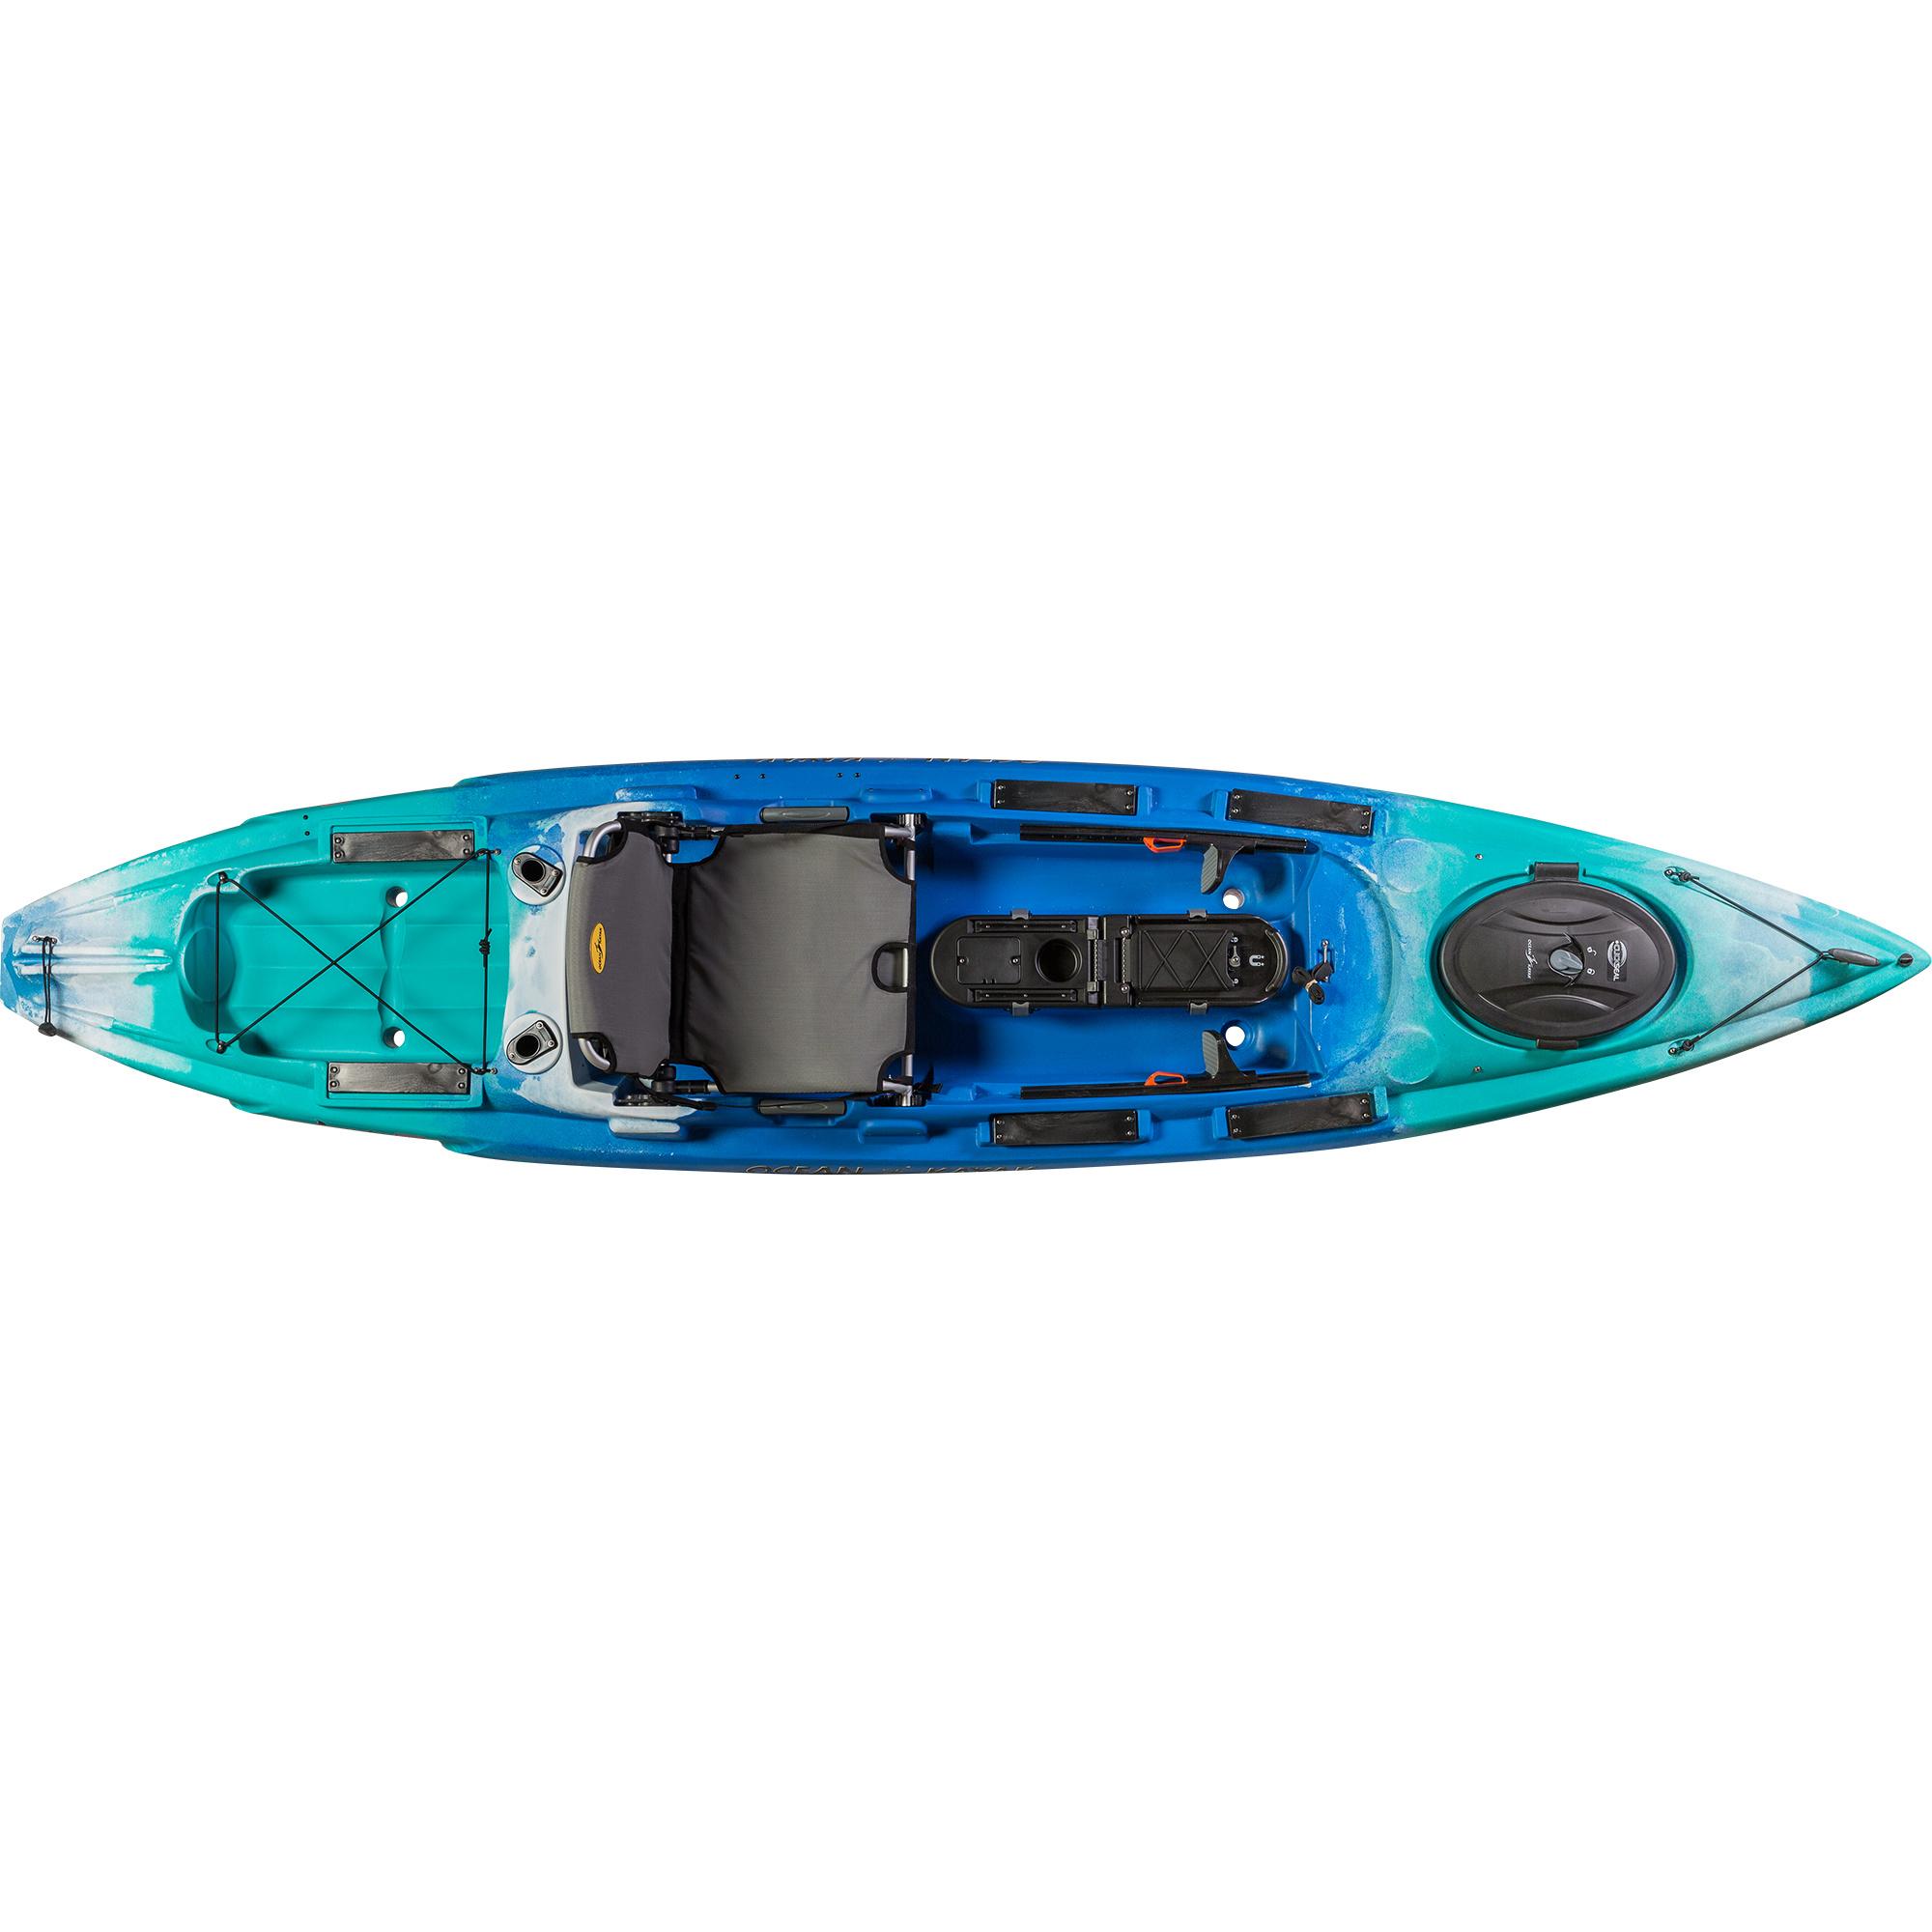 Ocean Kayak Prowler Big Game II Angler Kayak